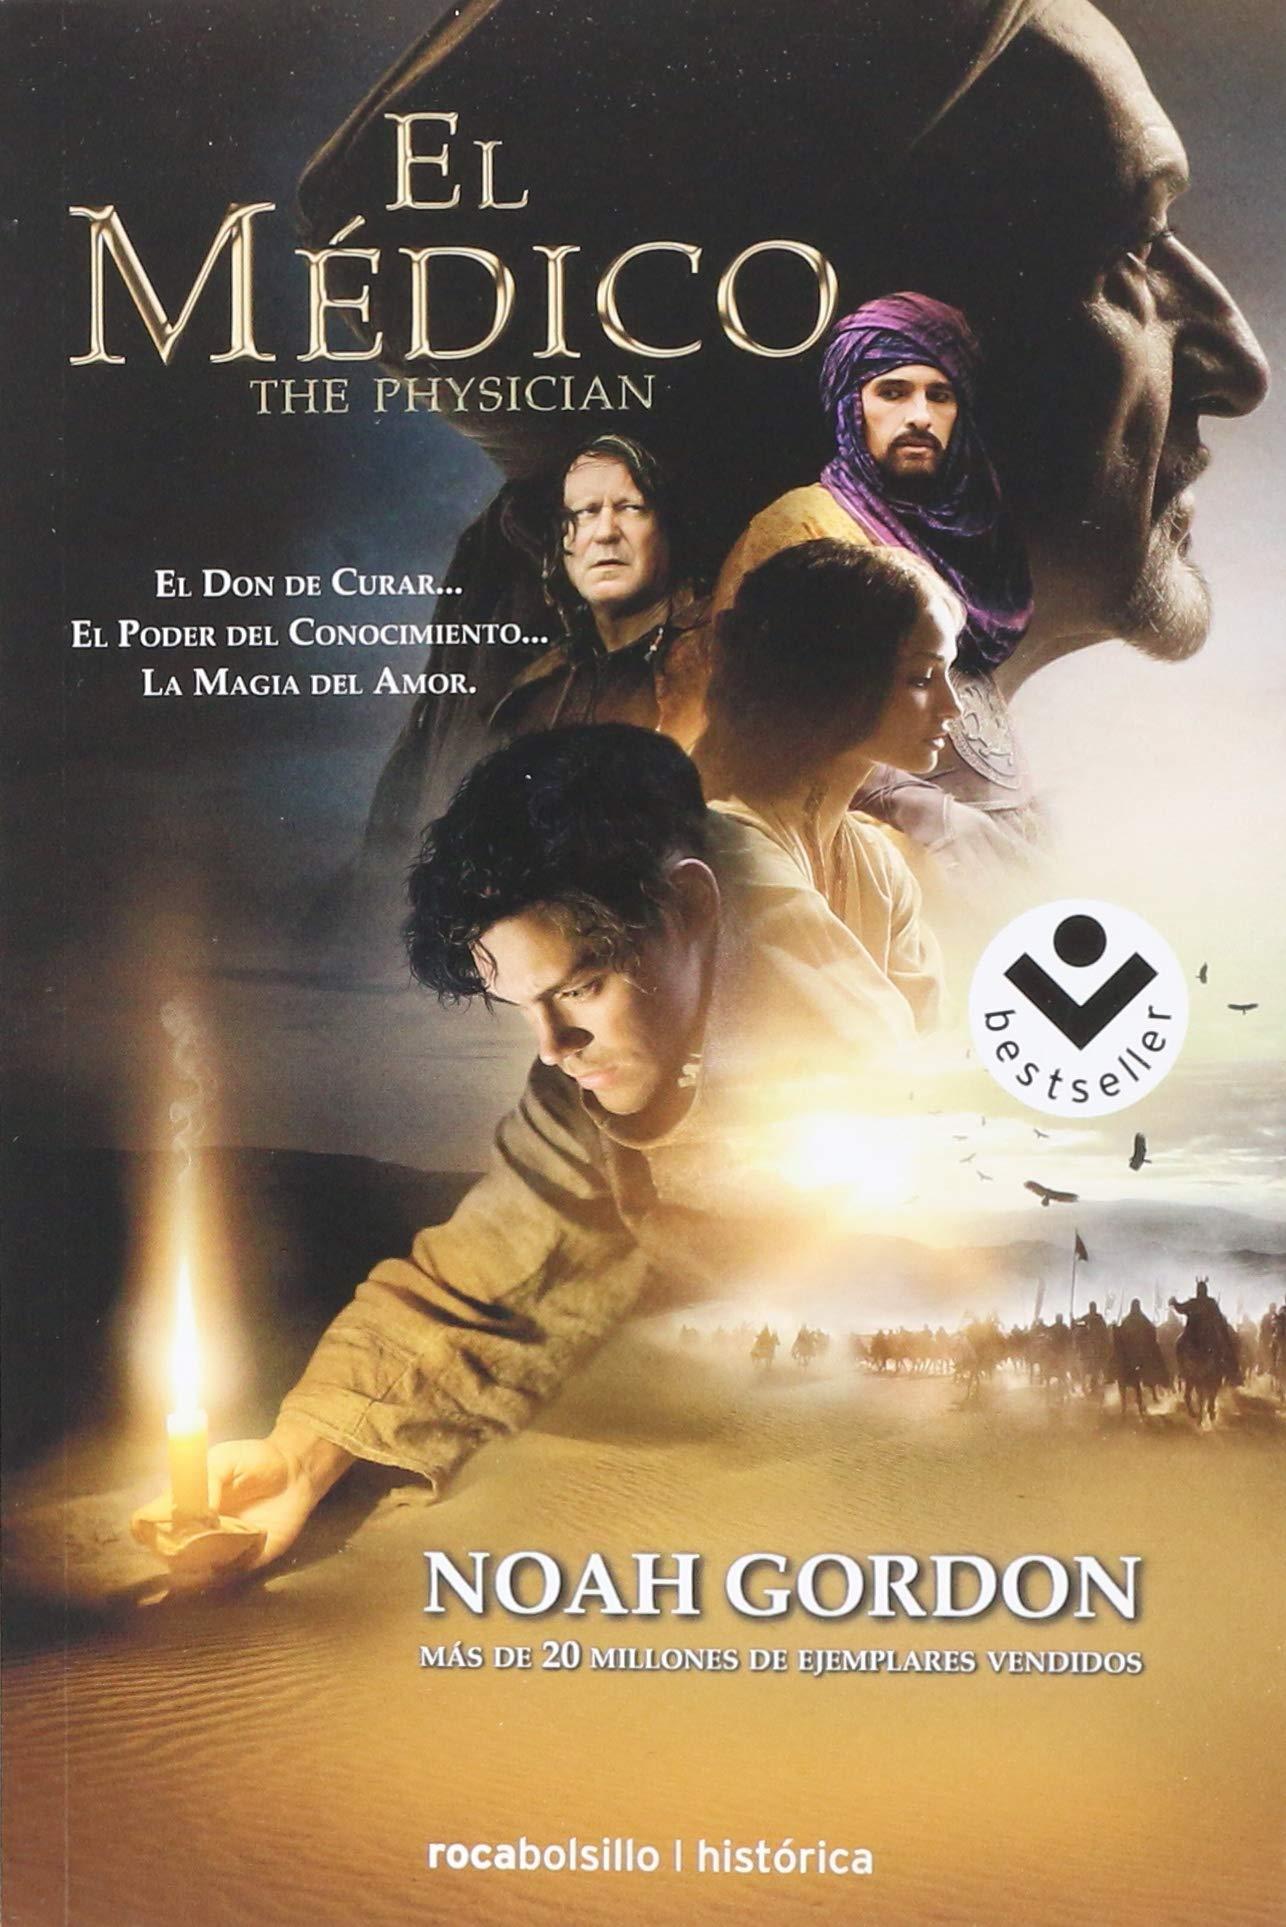 El medico (Spanish Edition): Noah Gordon: 9788415729259: Amazon.com: Books